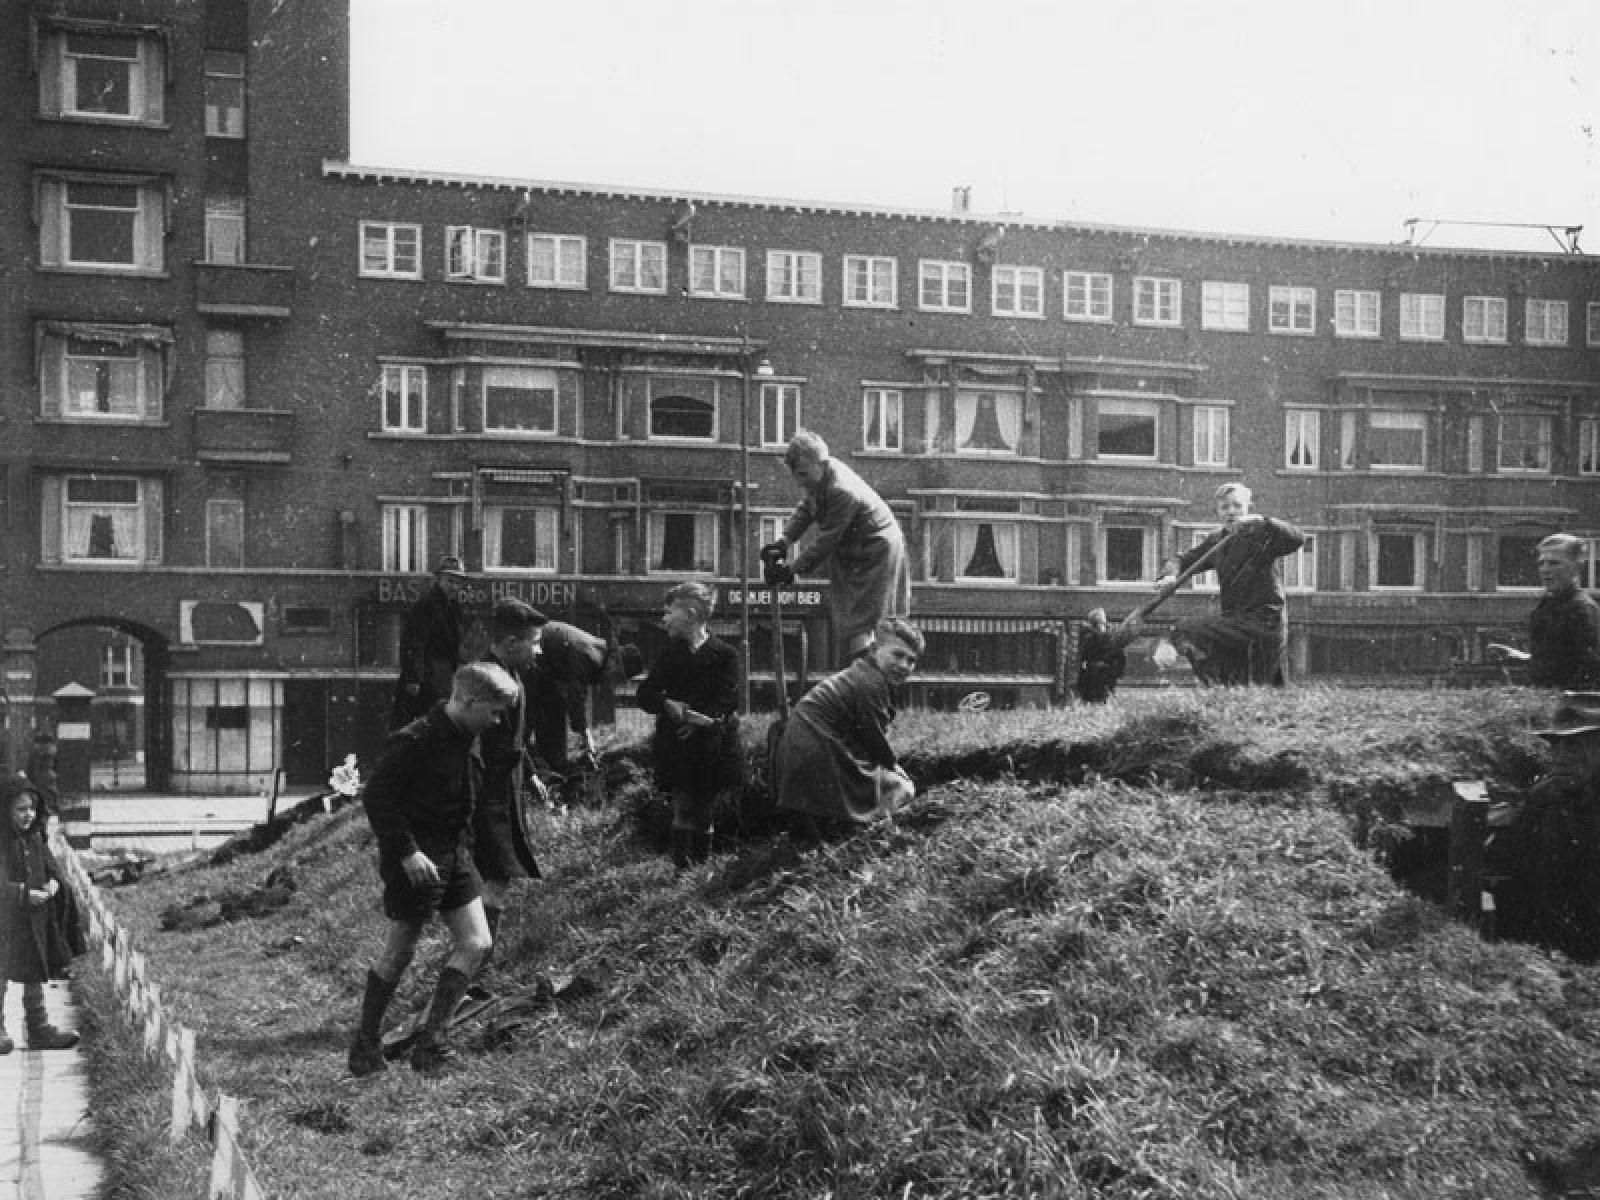 1944 45 sloop hout v Rhijn NL Rt SA 4140 1977 3633 01